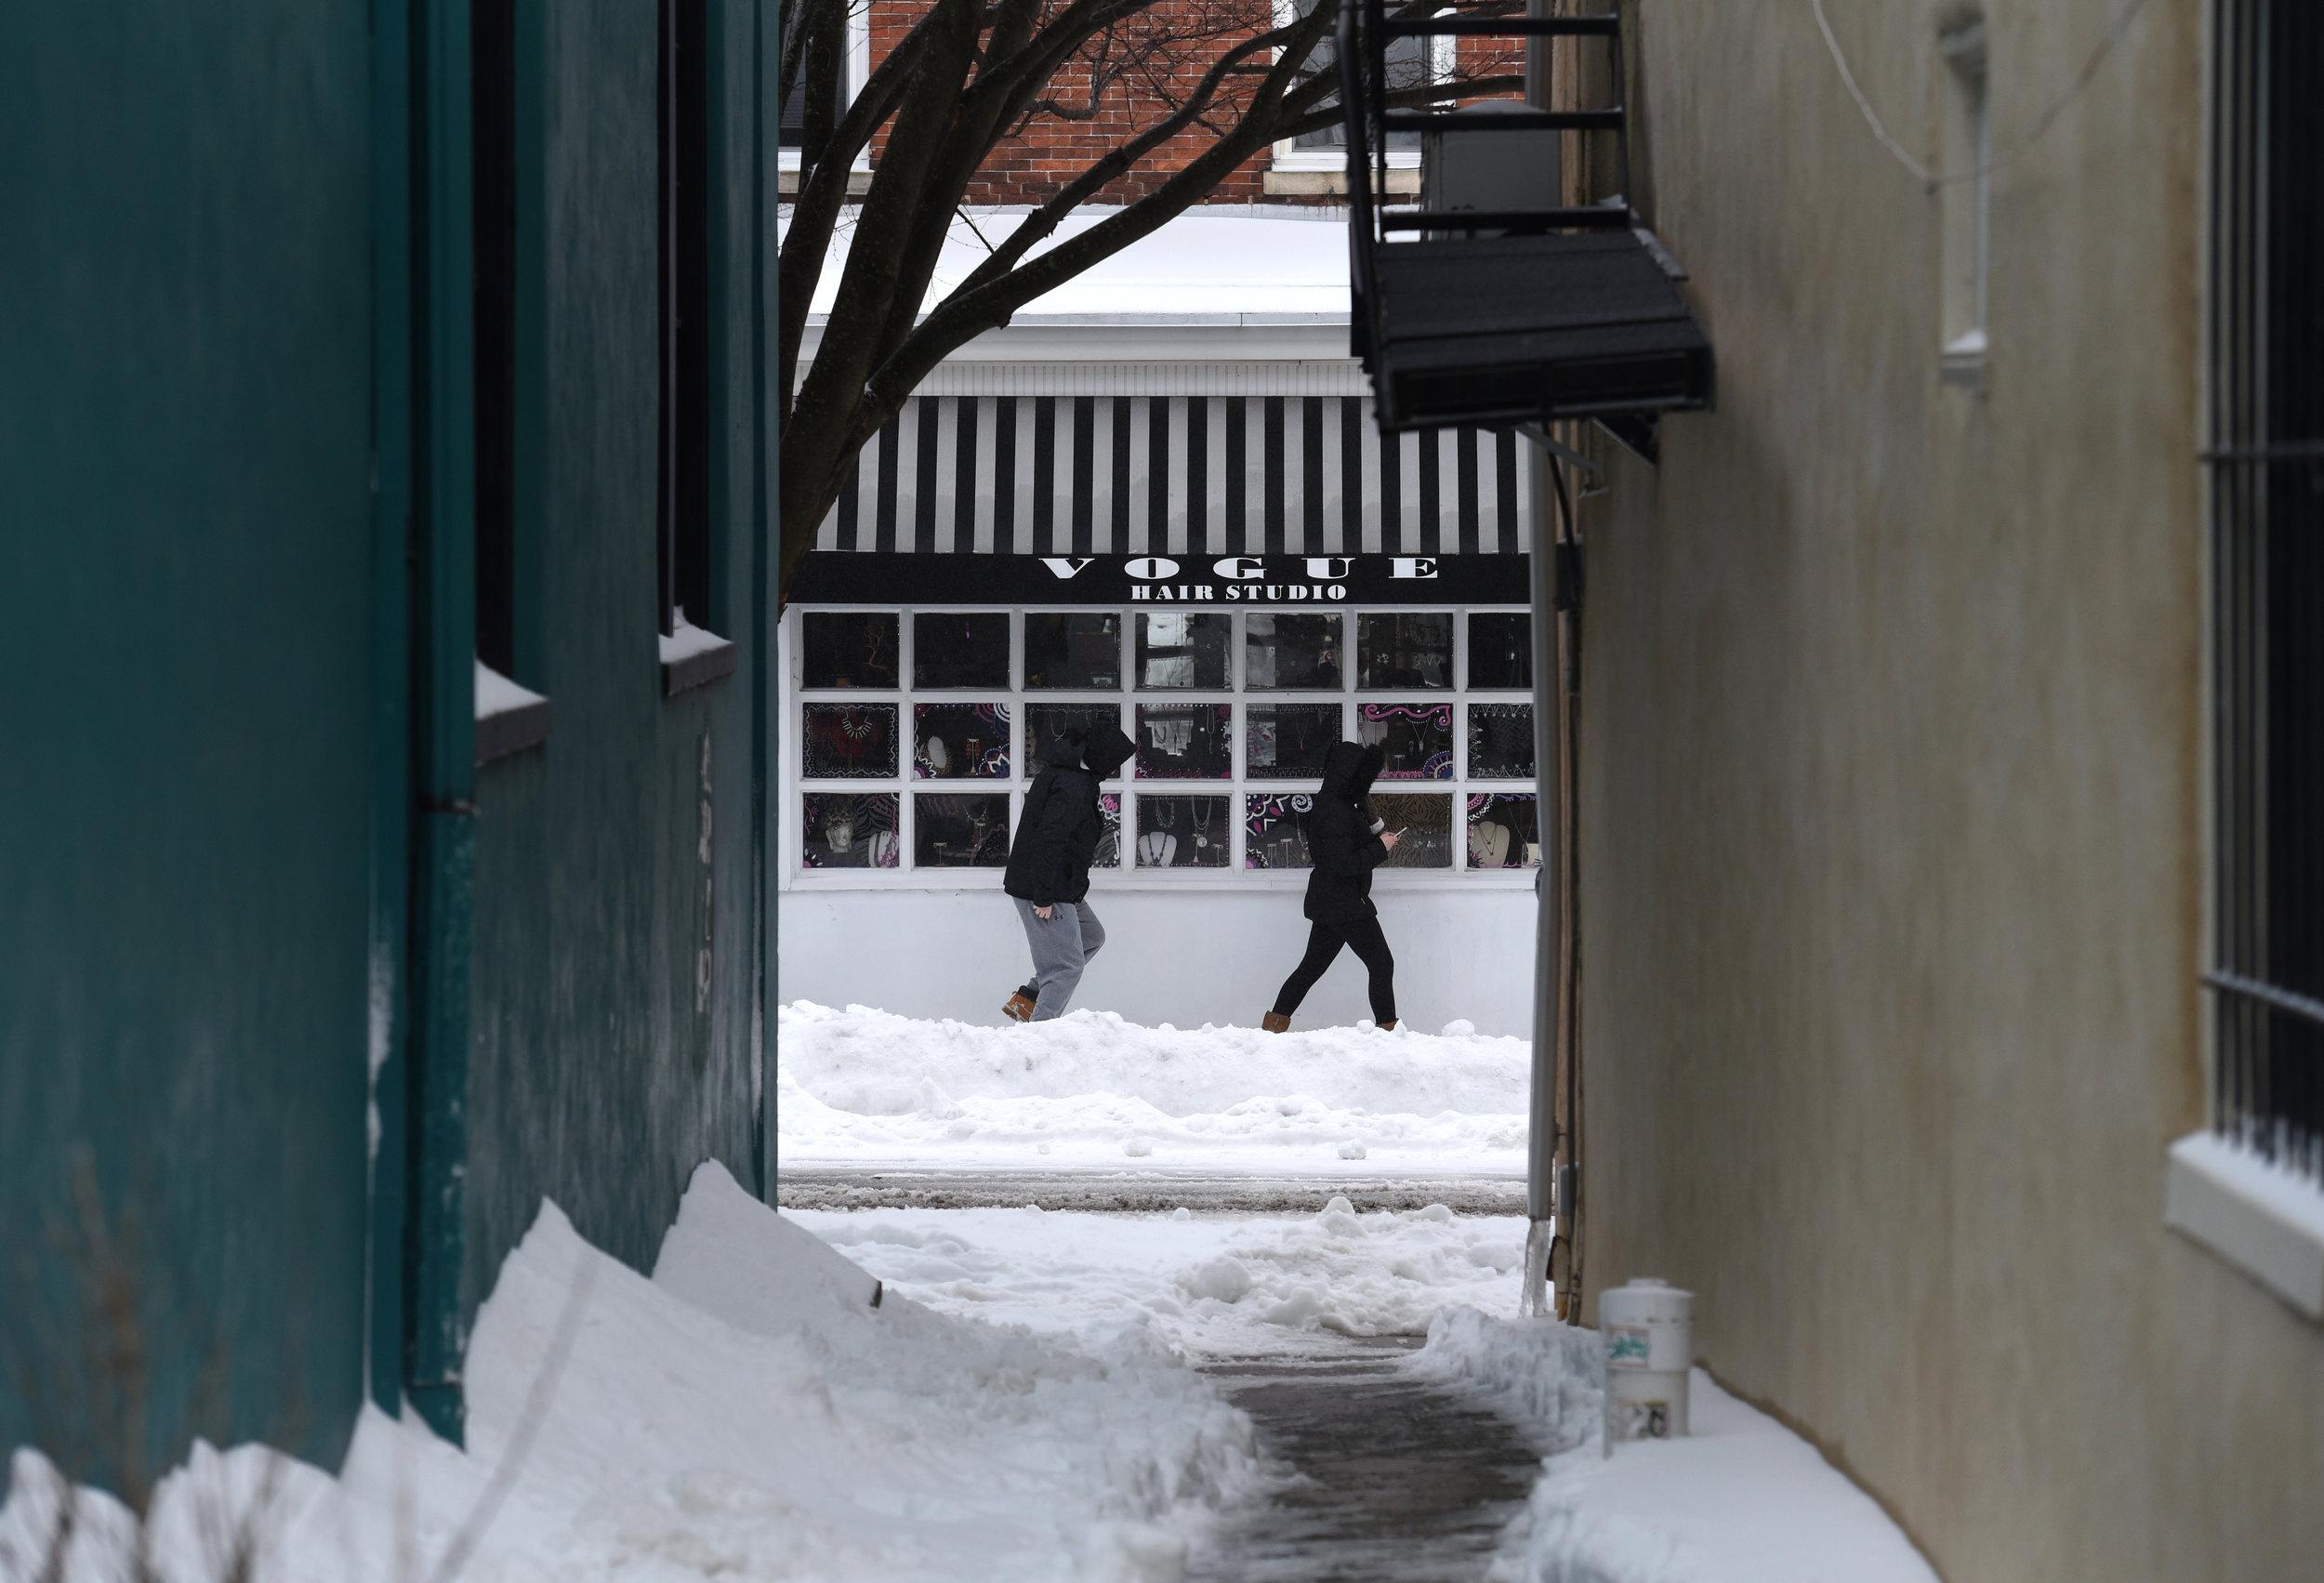 031517dl snow pics 08 ce.JPG